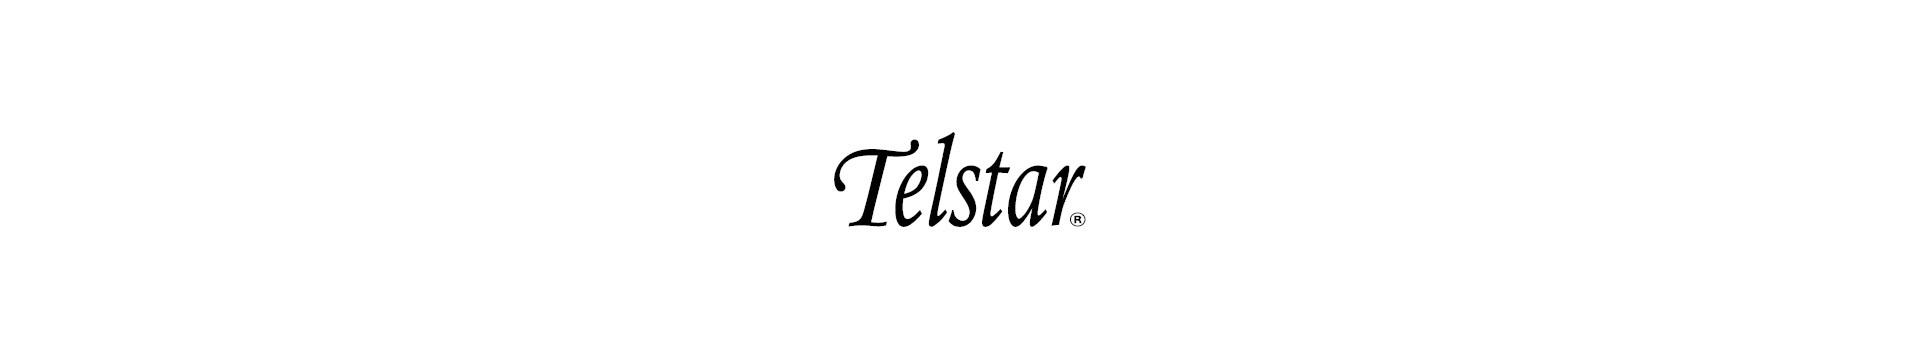 Telstar Cz